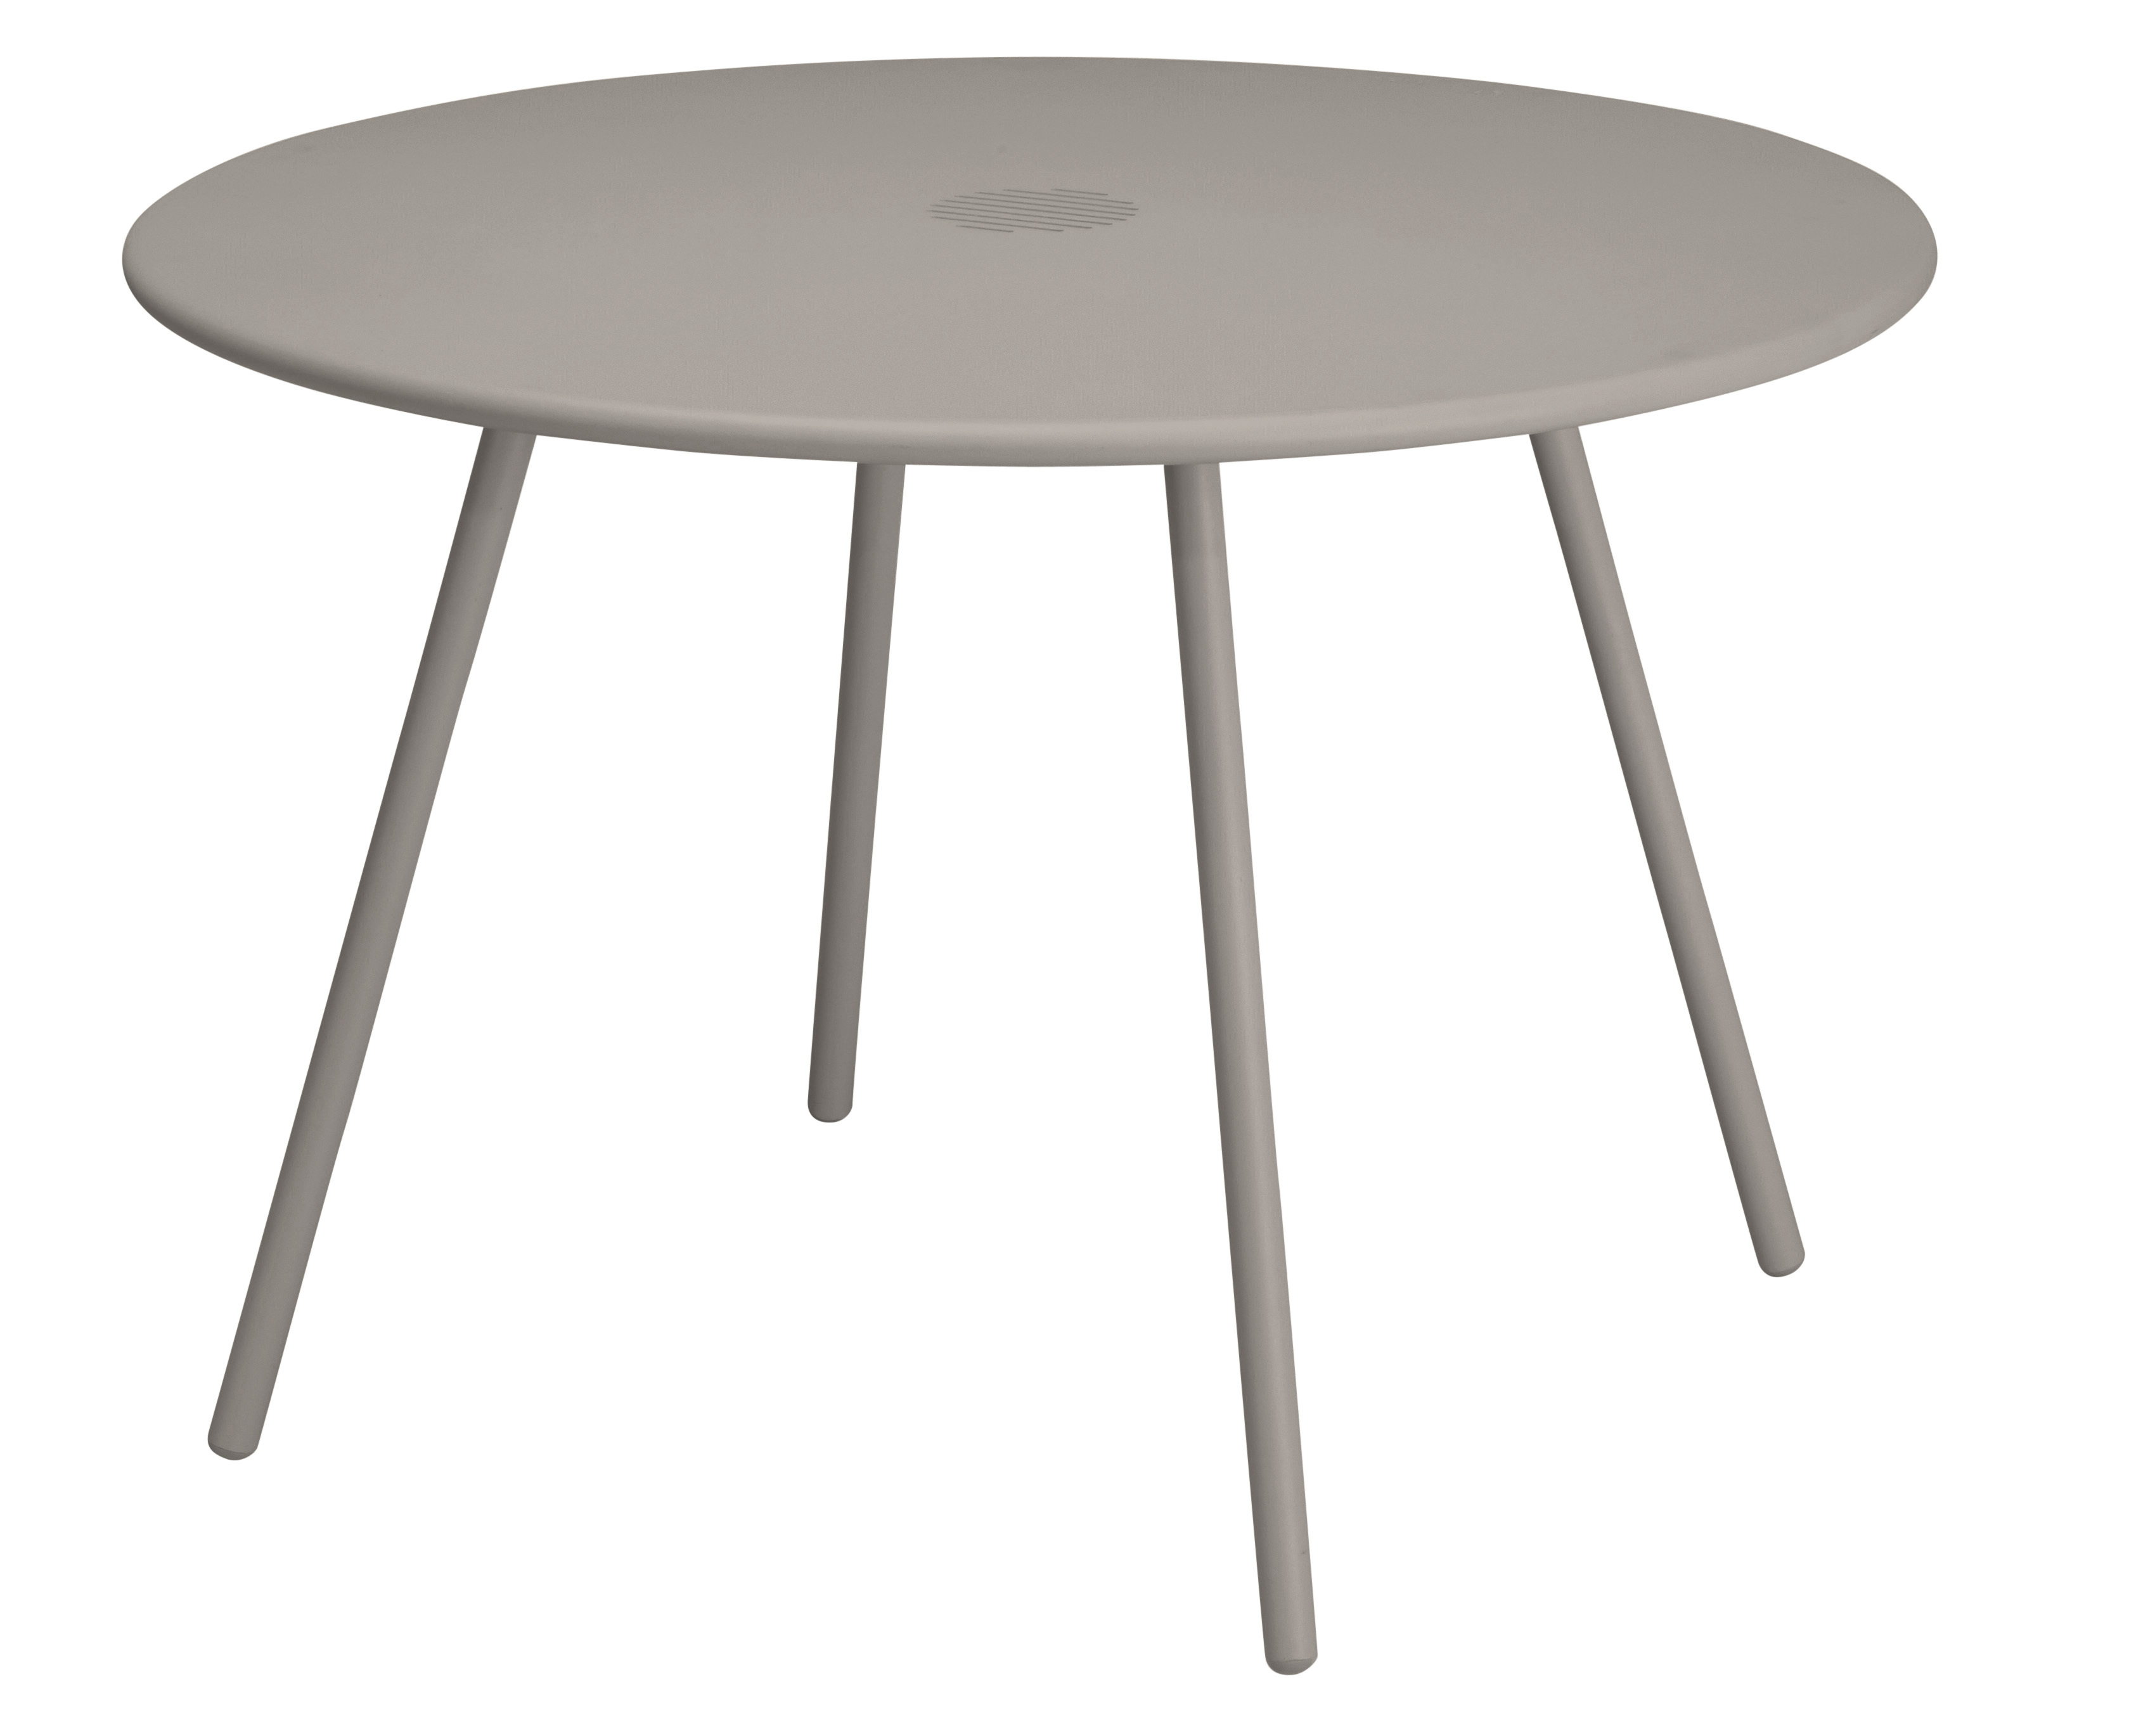 HYBA - Table ronde de jardin Alu 151 - Taupe - pas cher ...